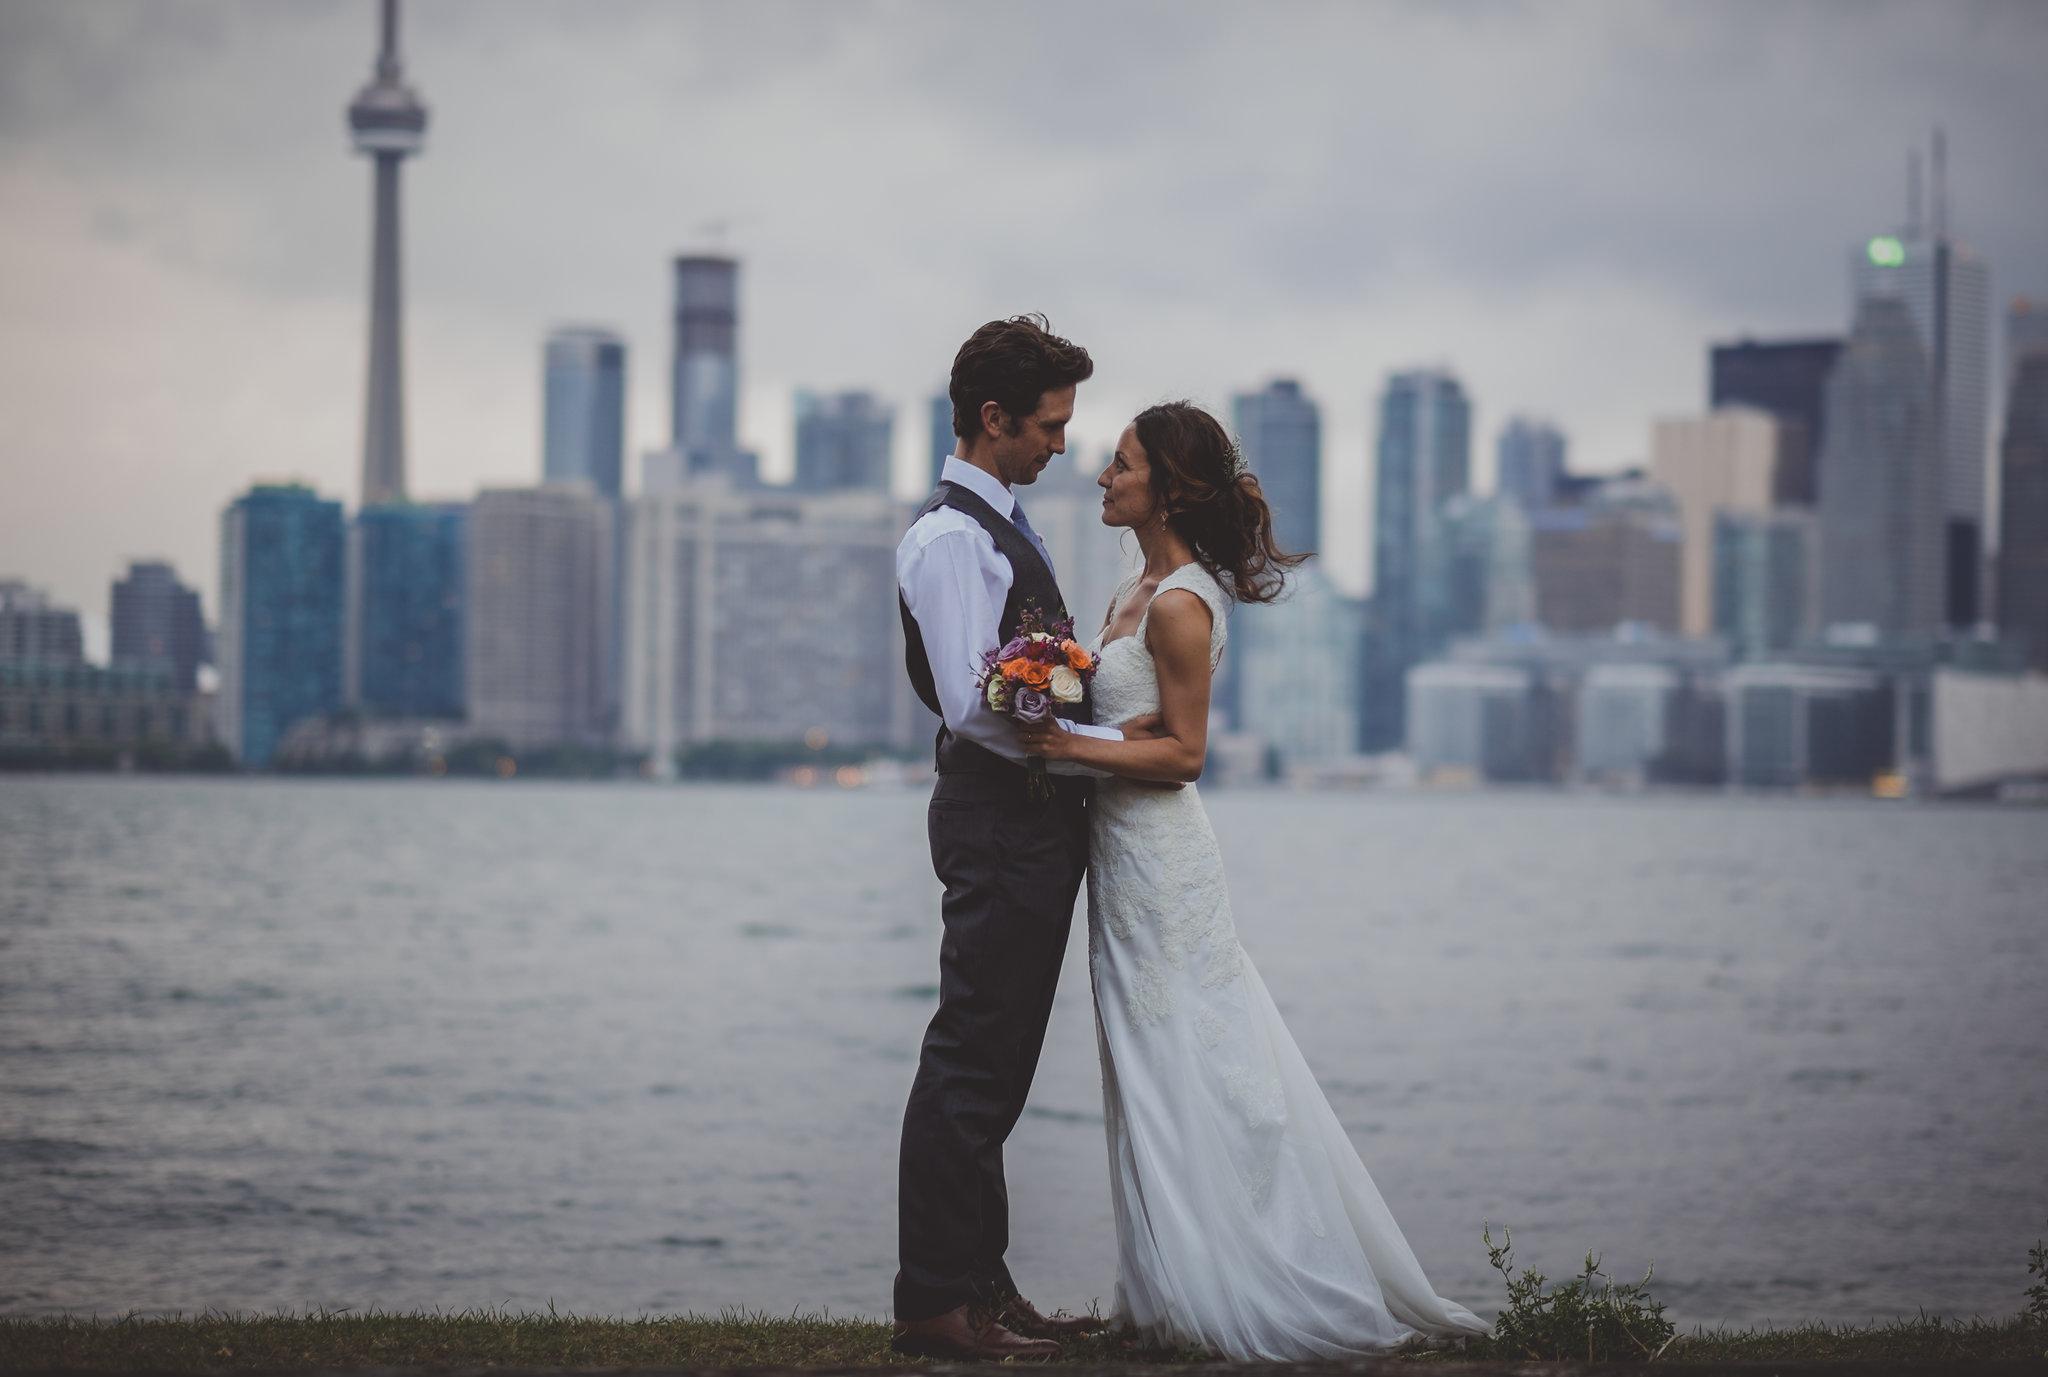 Dream_Wedding_Wards Island_Toronto DSCF6982 (1).jpg